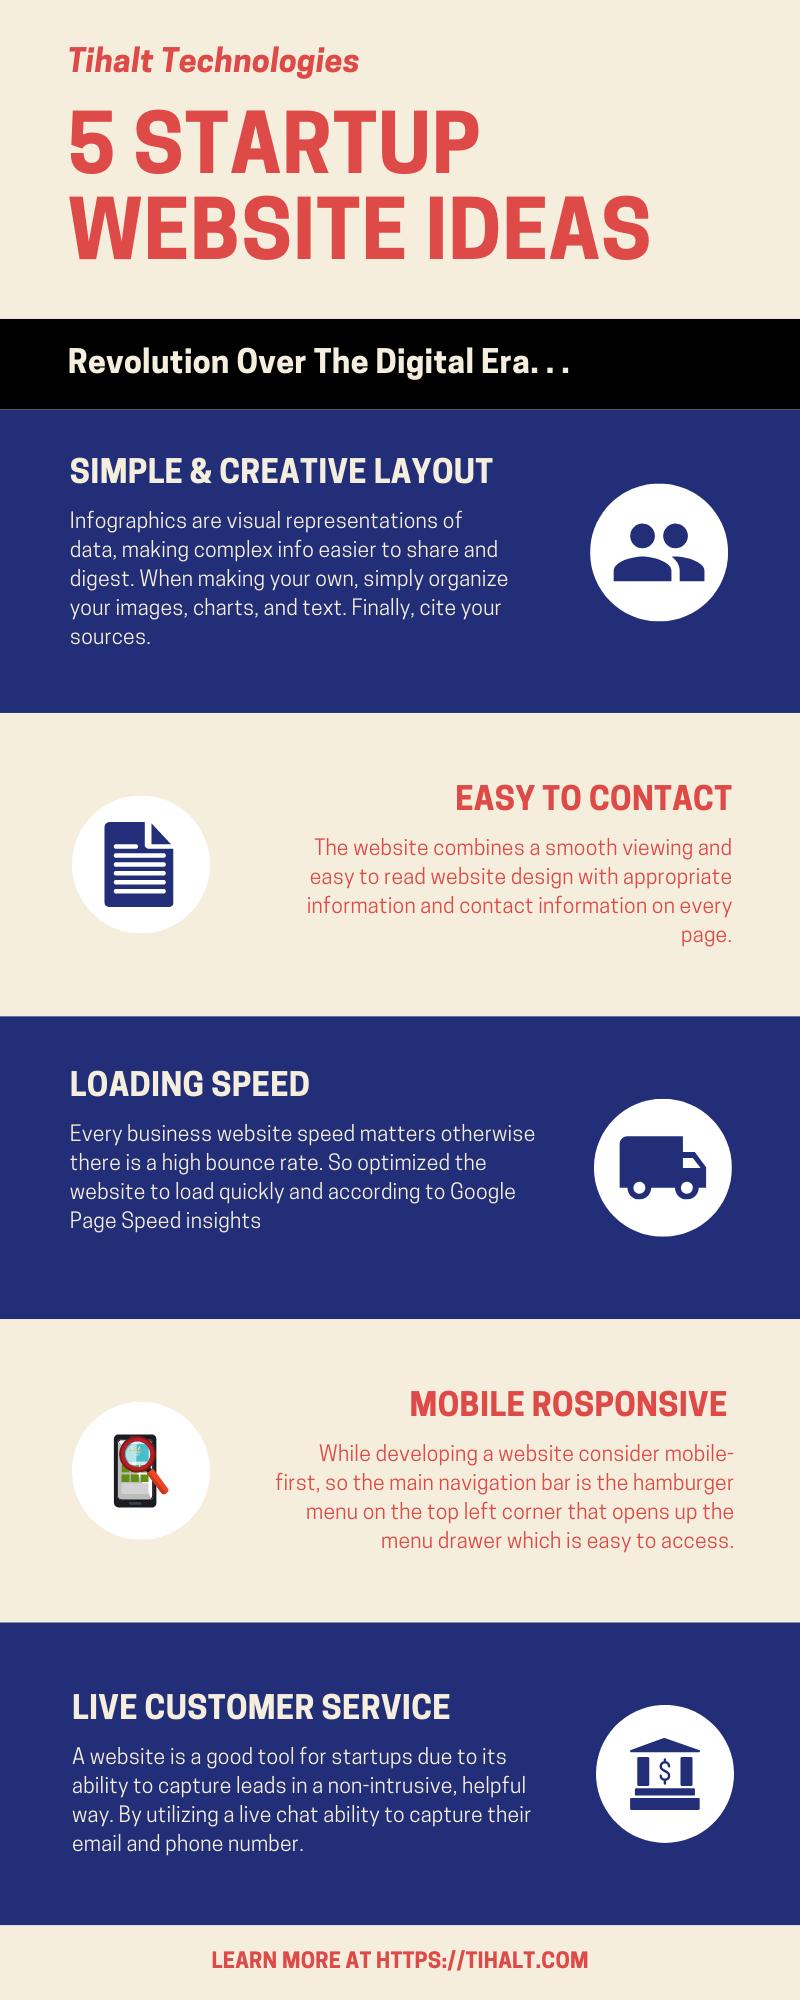 Tob 5 Startups Website Ideas Tihalt Technologies Startup Website Web Design Website Design Services